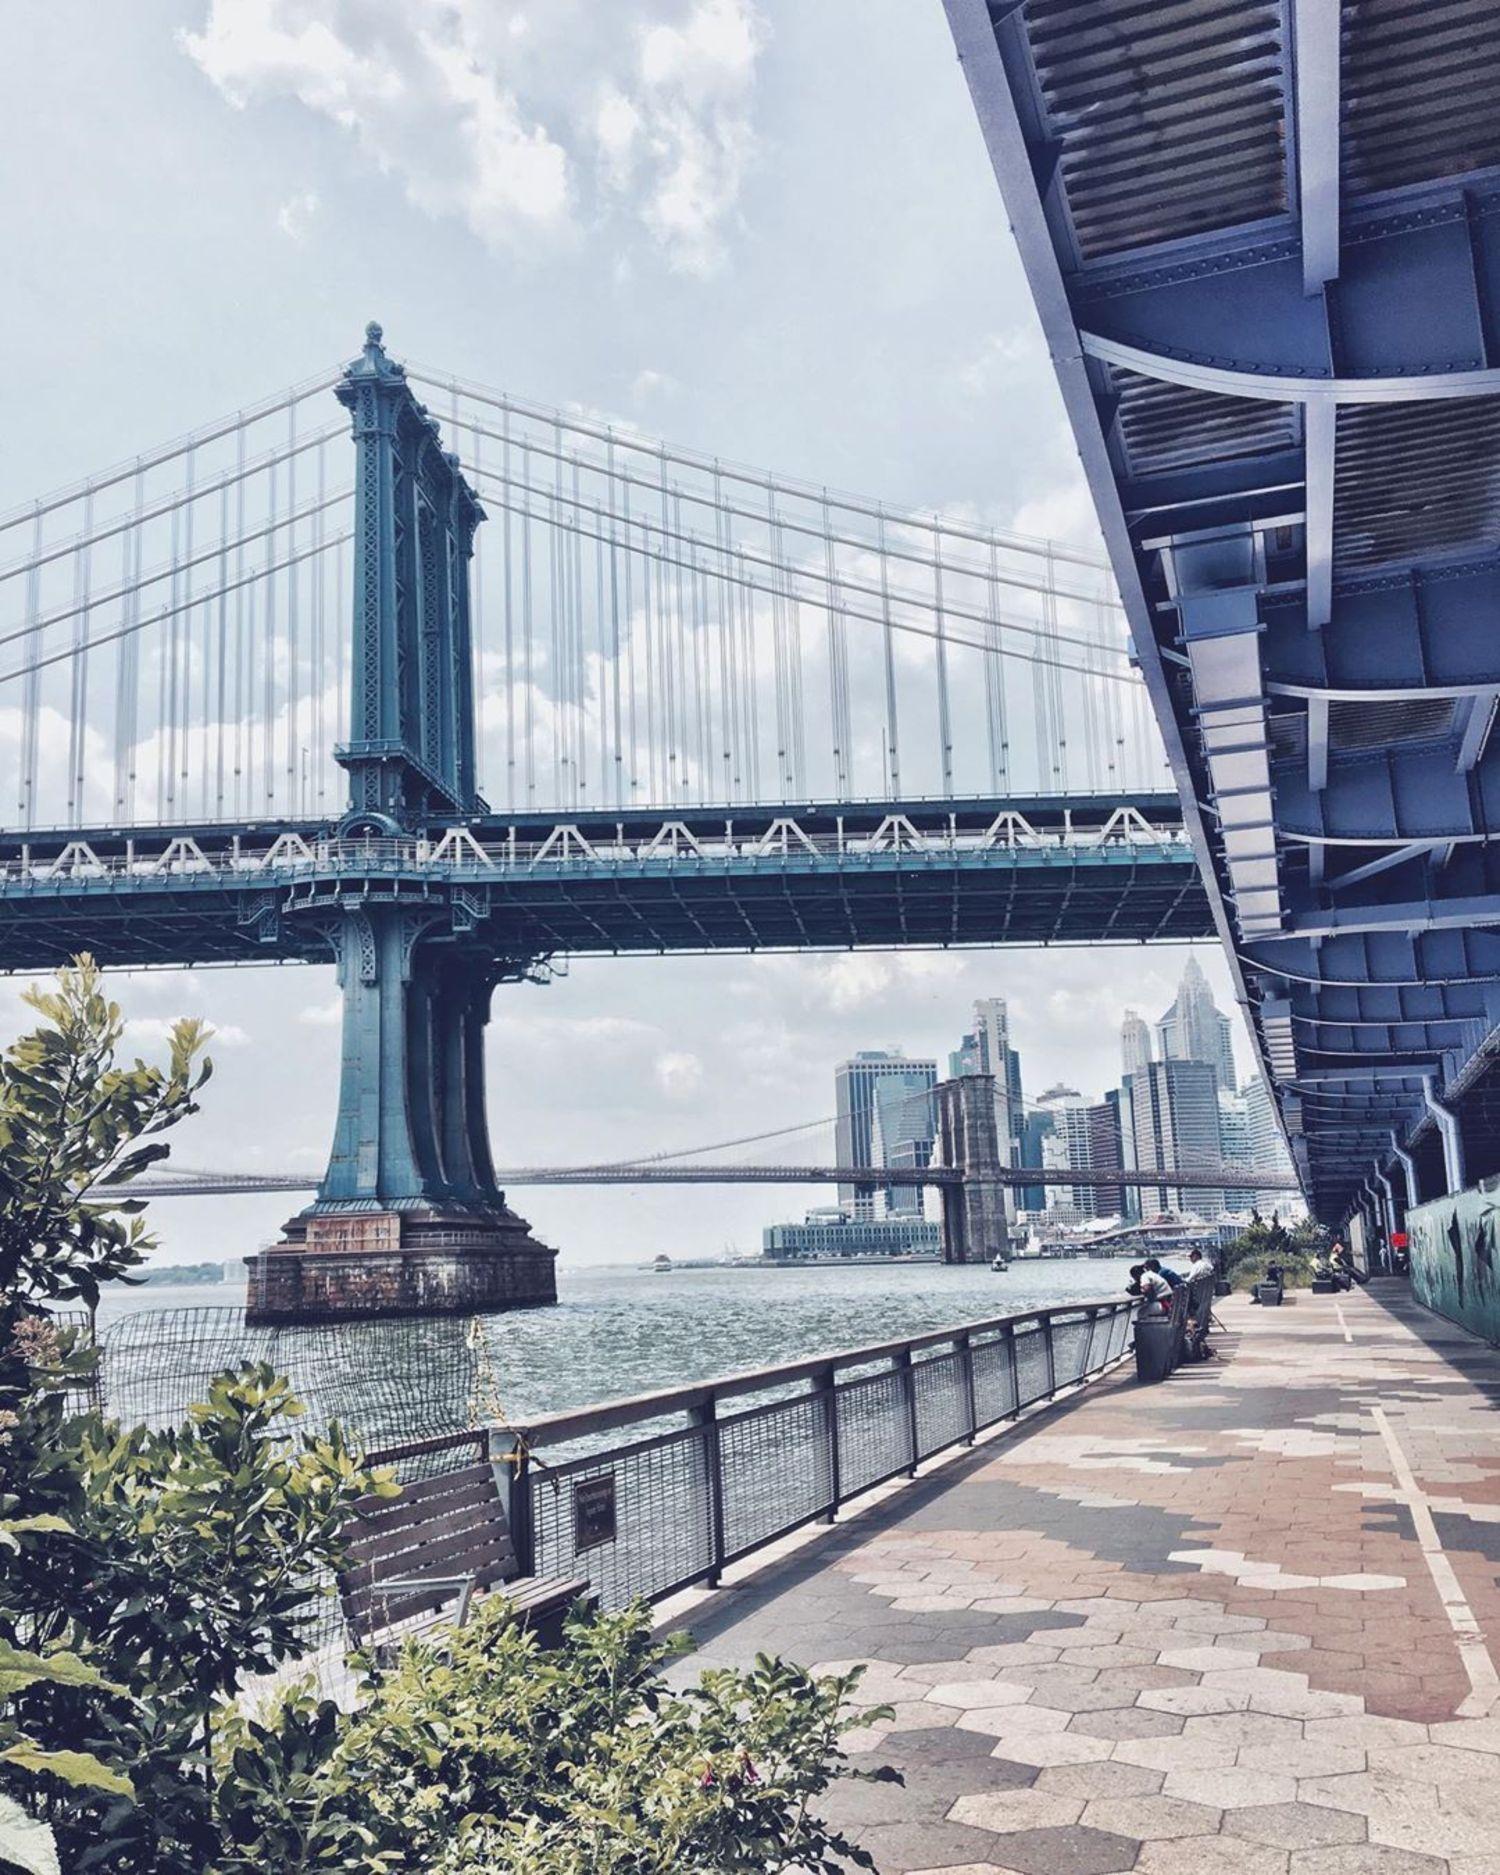 Lower East Side, Manhattan